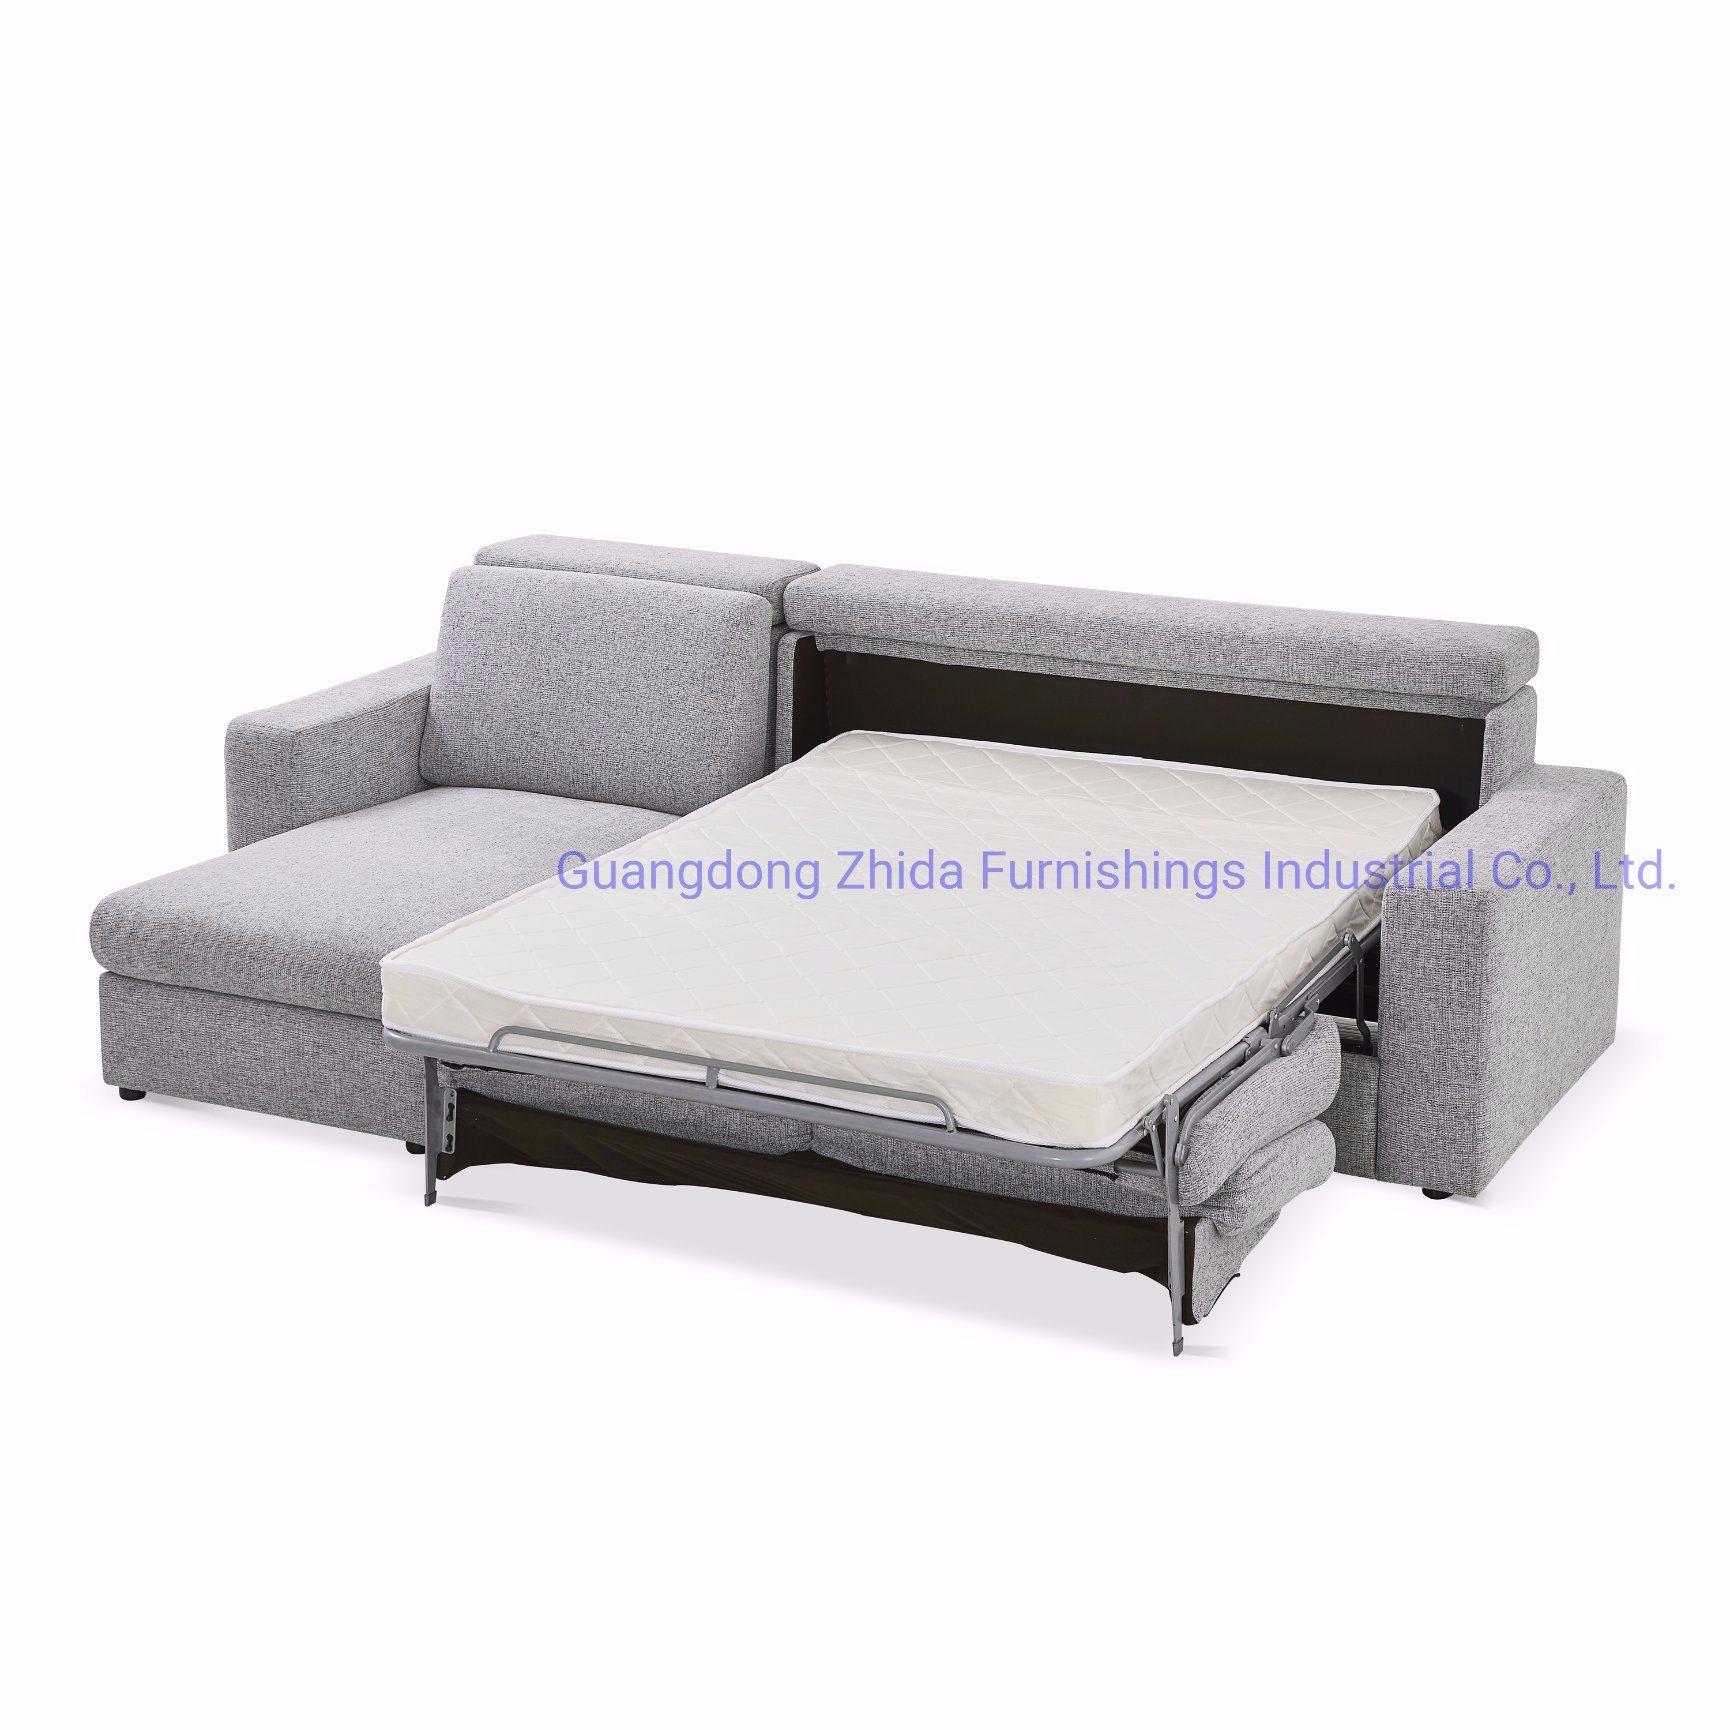 China High Qualtiy Modern Sofa Bed With